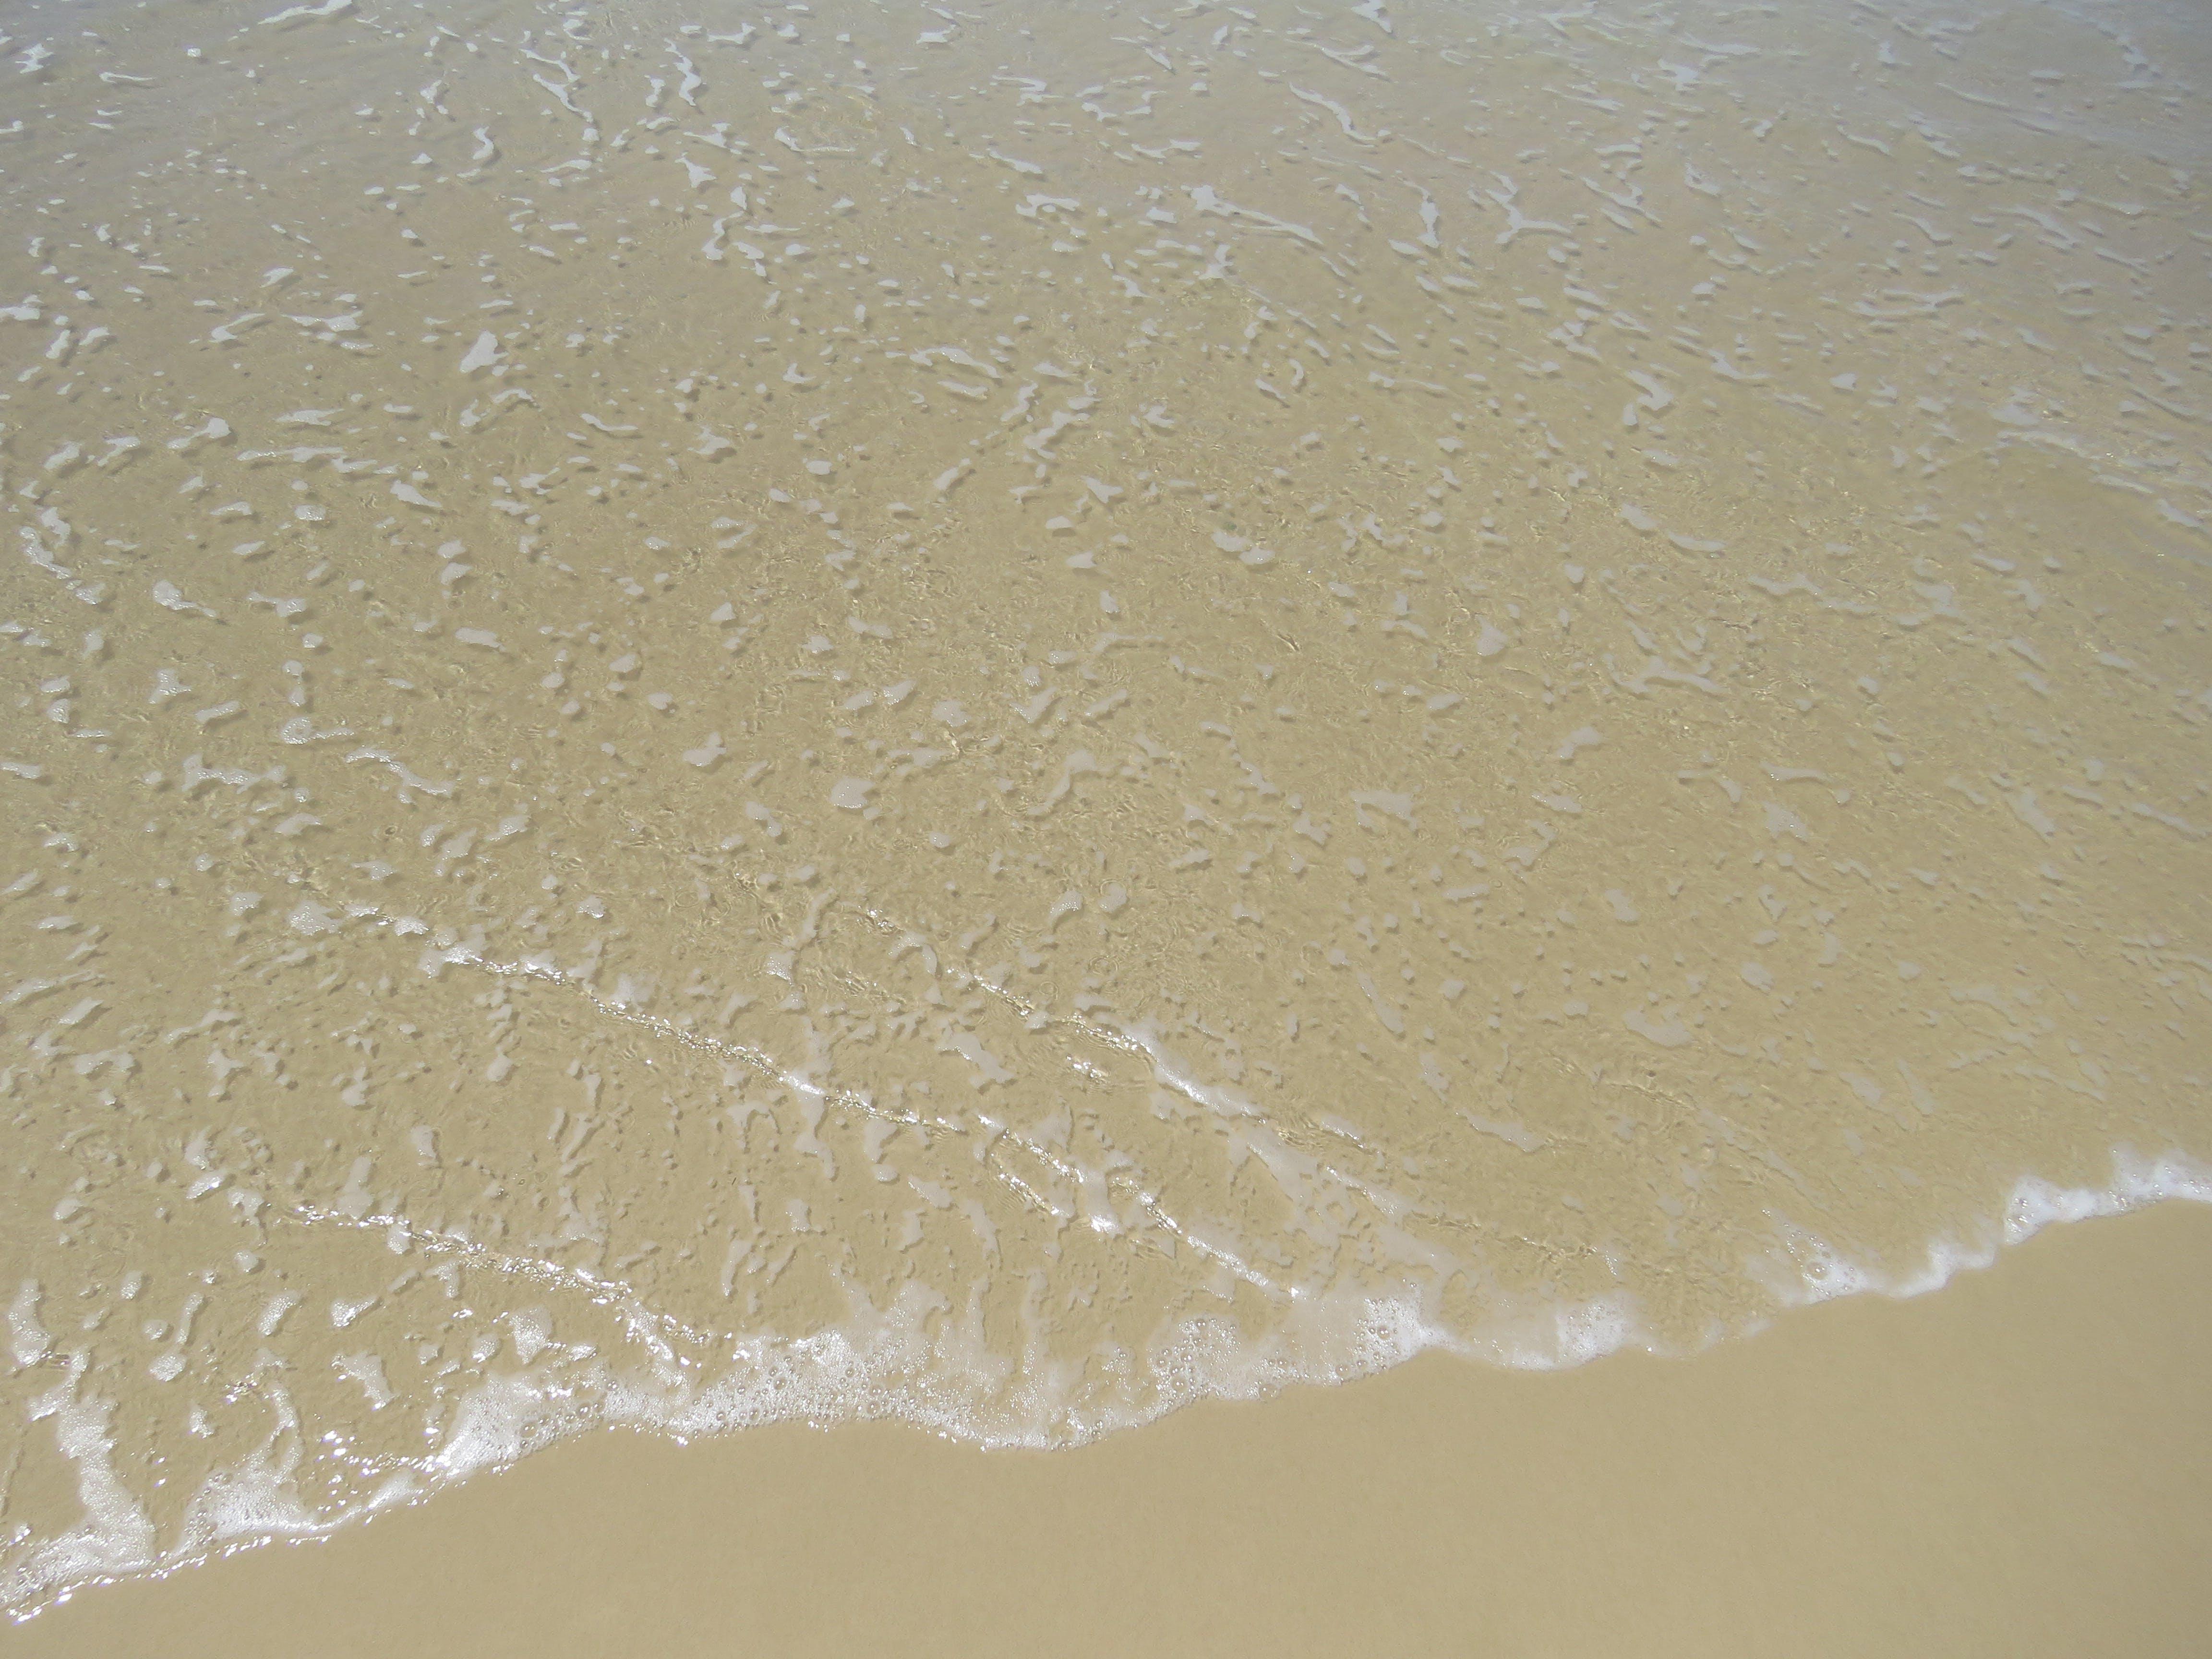 Free stock photo of beach sand